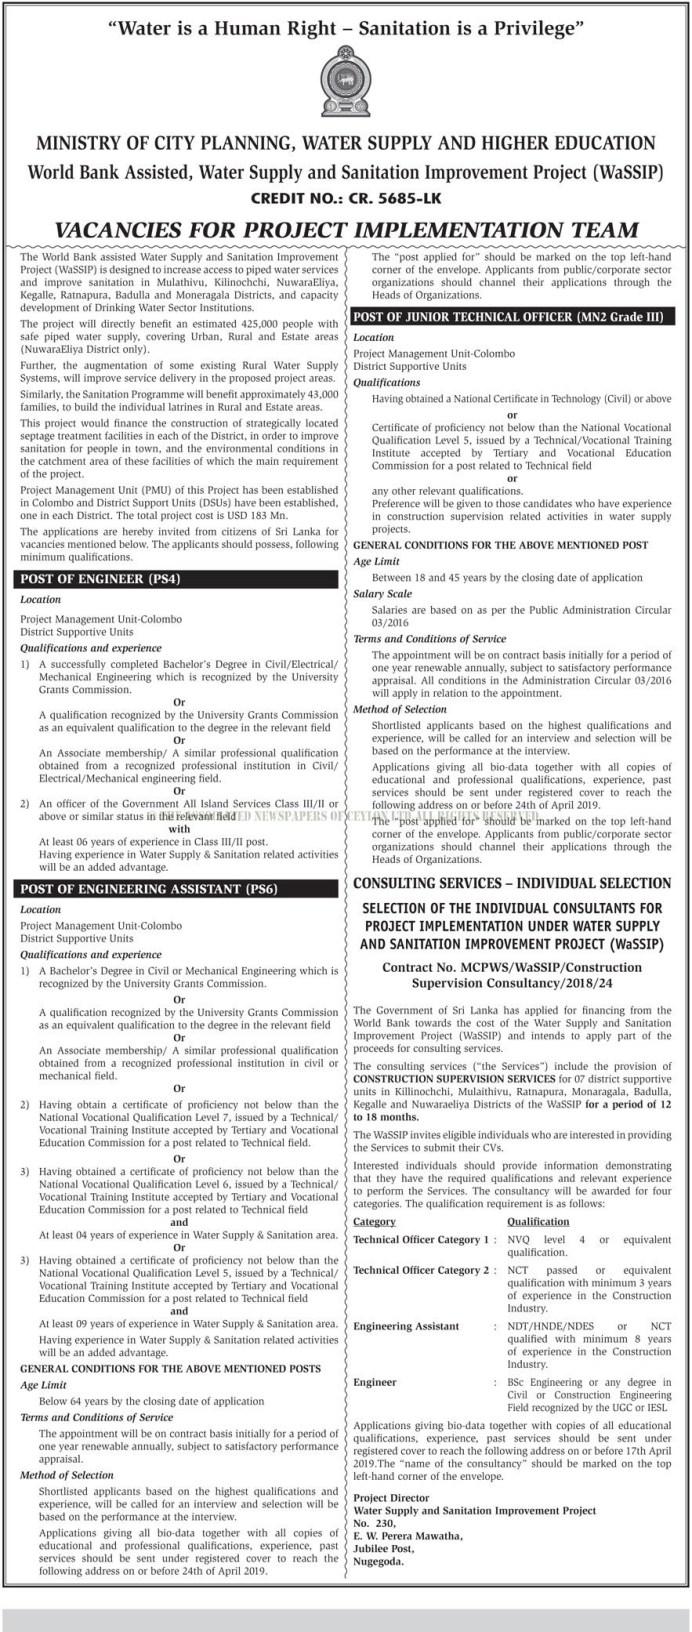 Job Vacancies - Ministry of City Planning, Water Supply